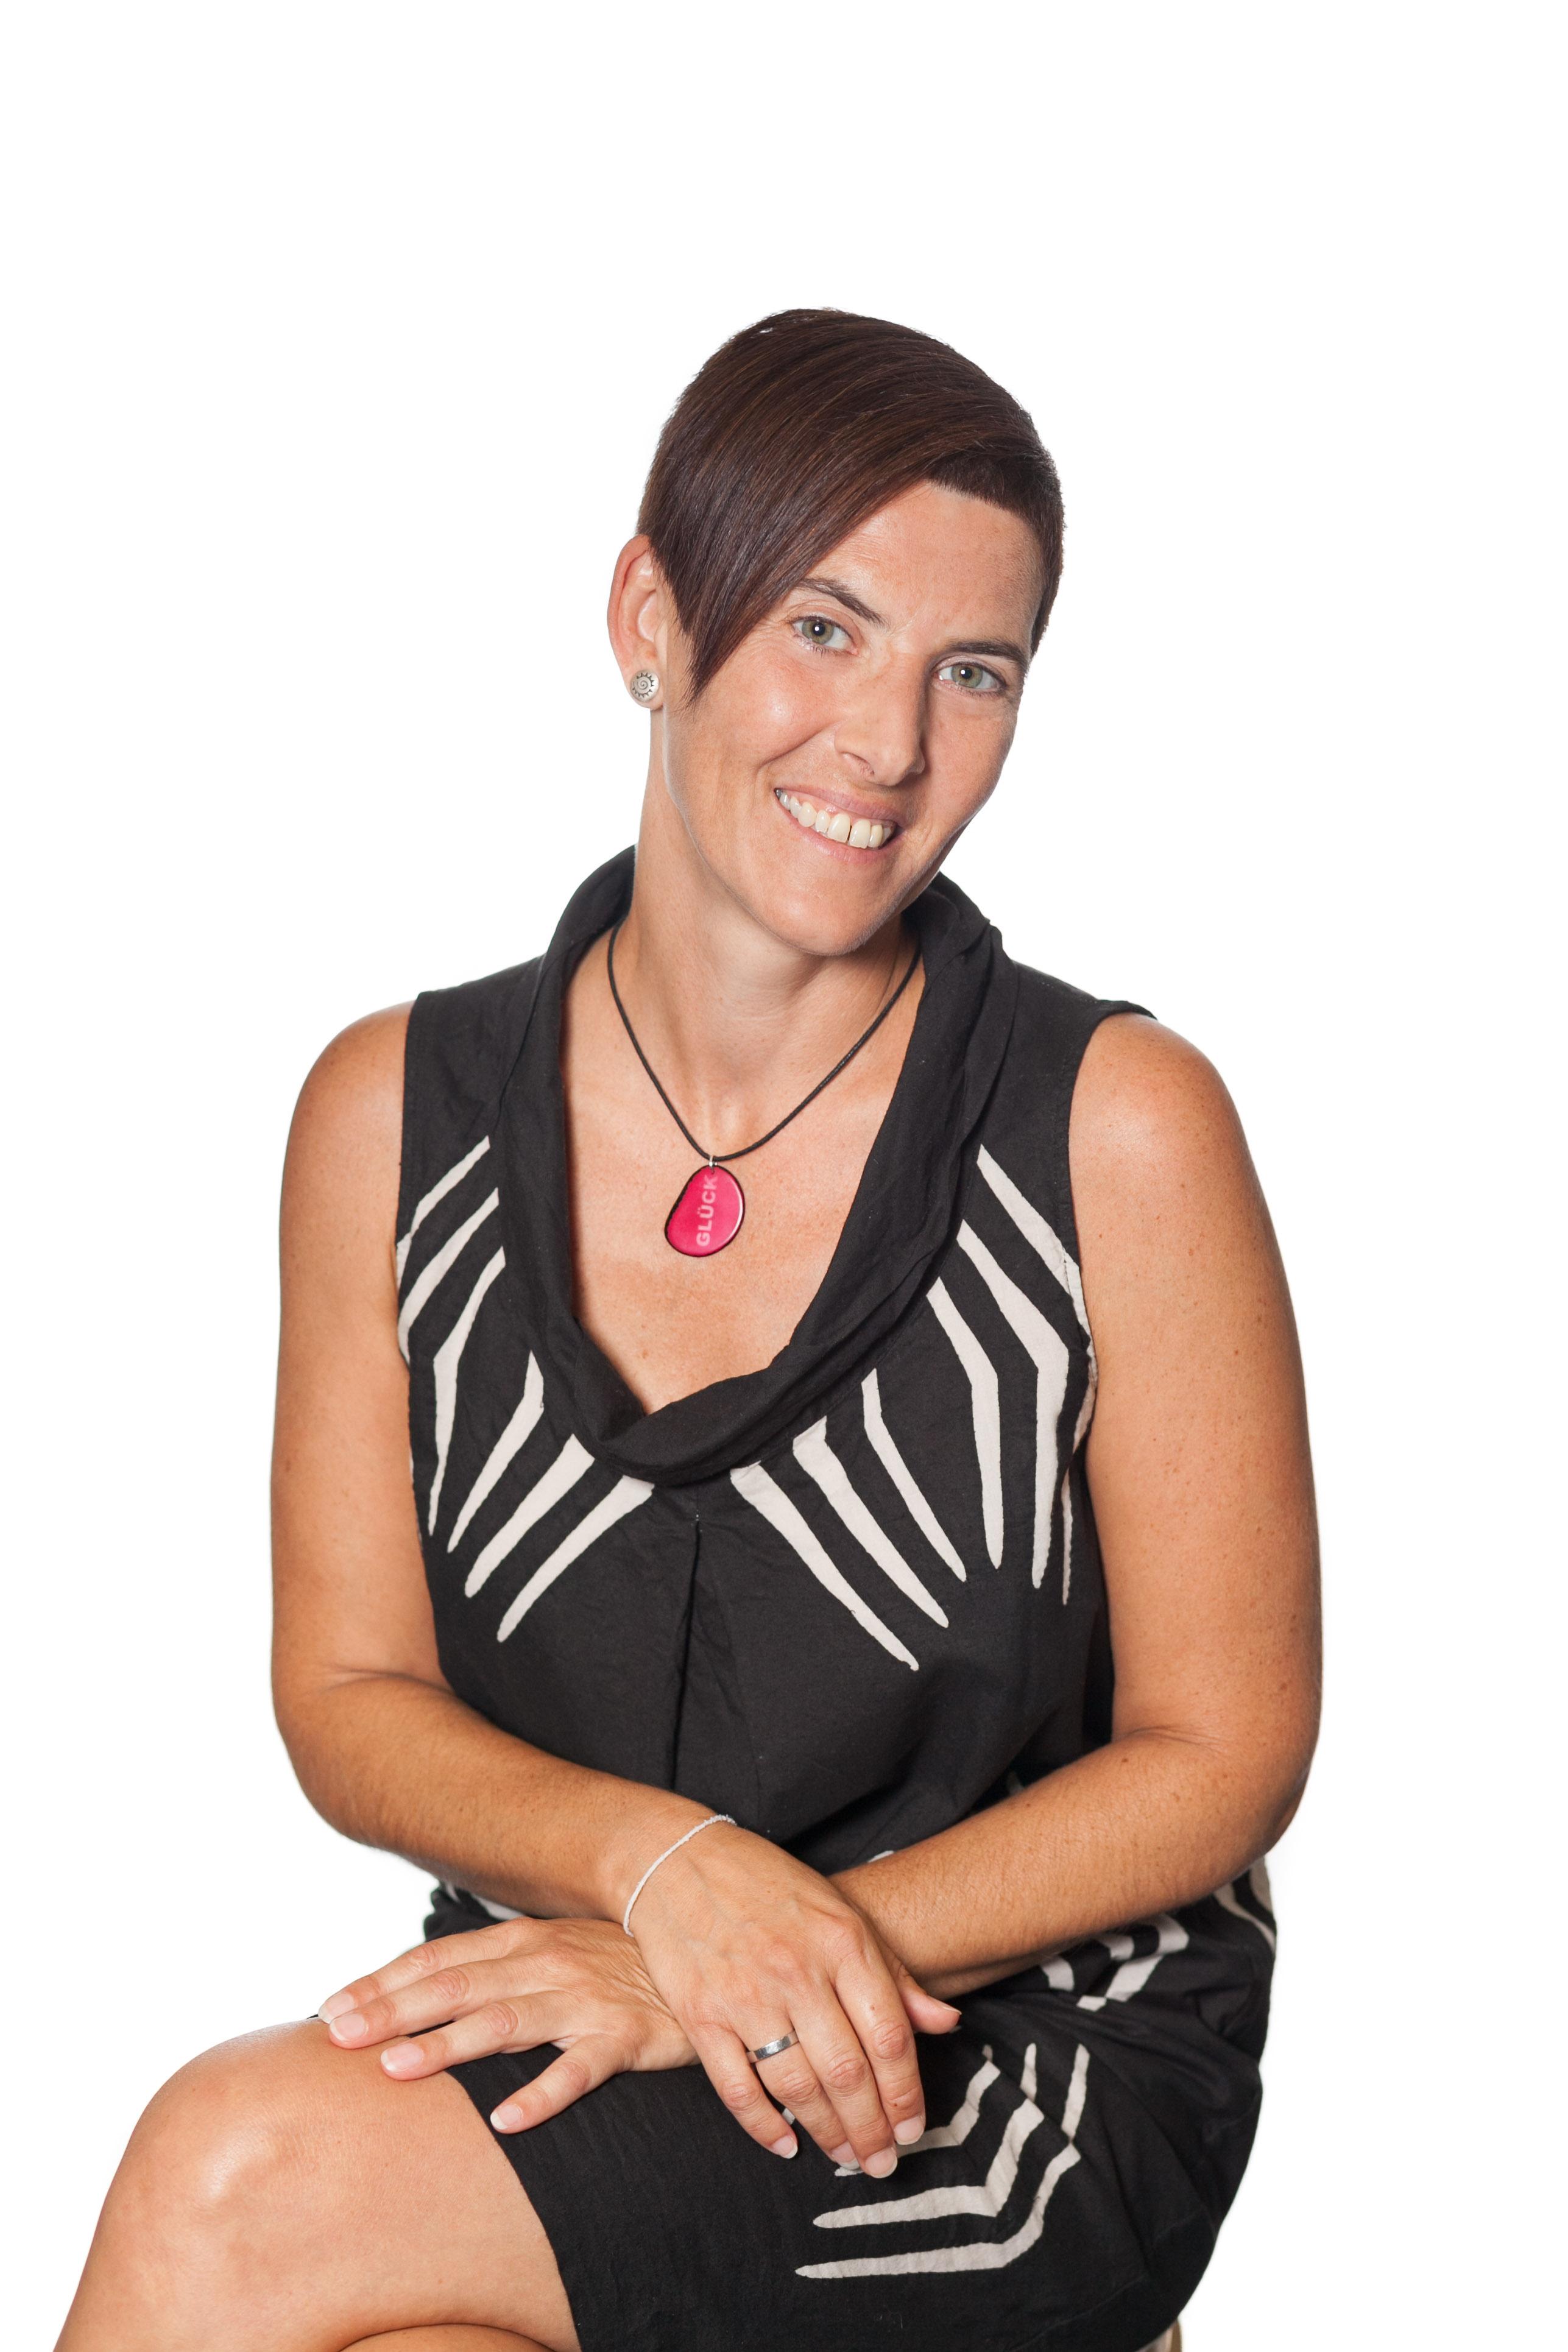 Karin Hiegesberger